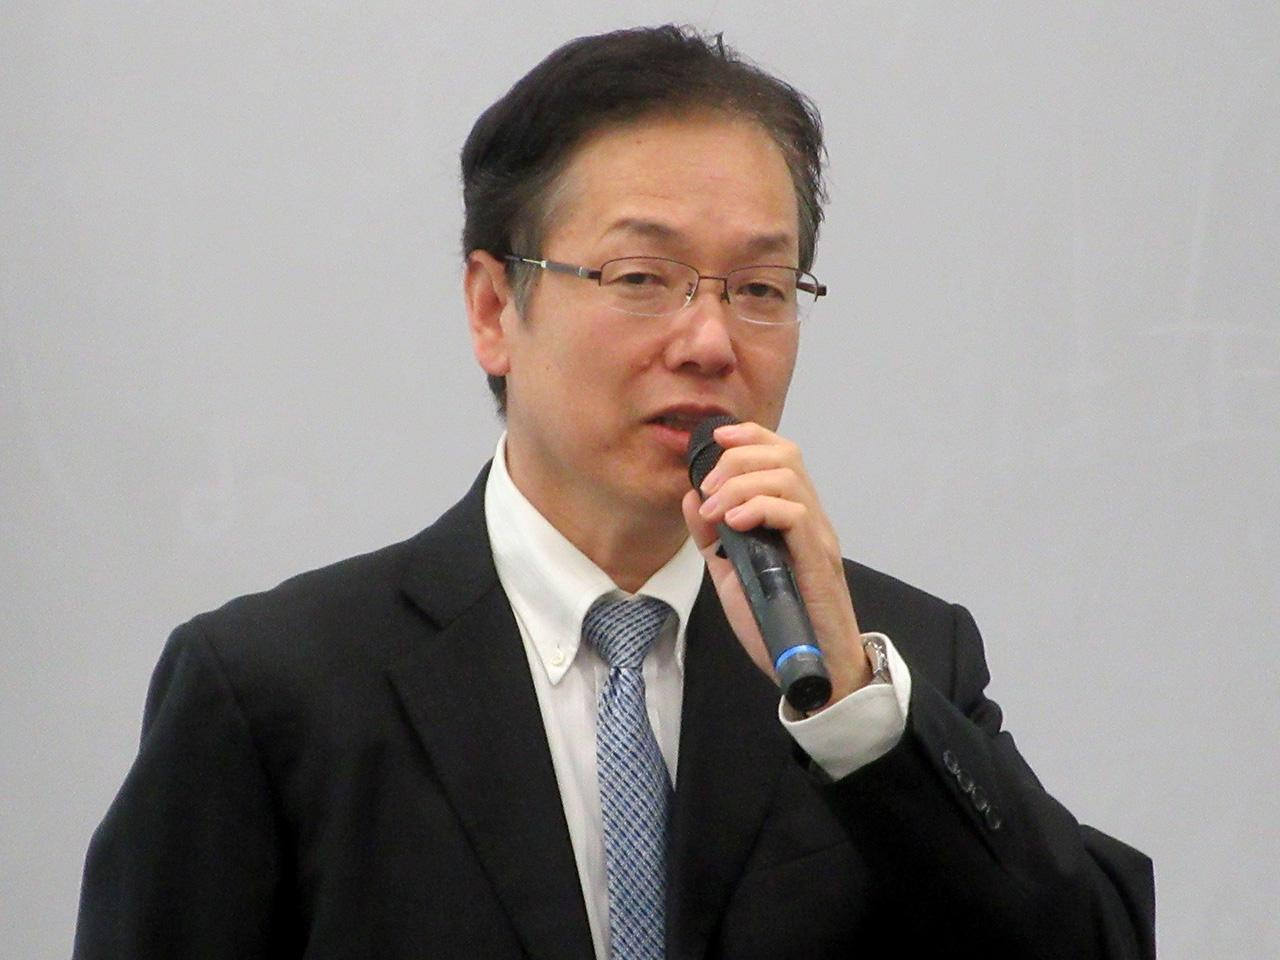 http://www.shinshu-u.ac.jp/faculty/econlaw/topics/sIMG_1514.jpg